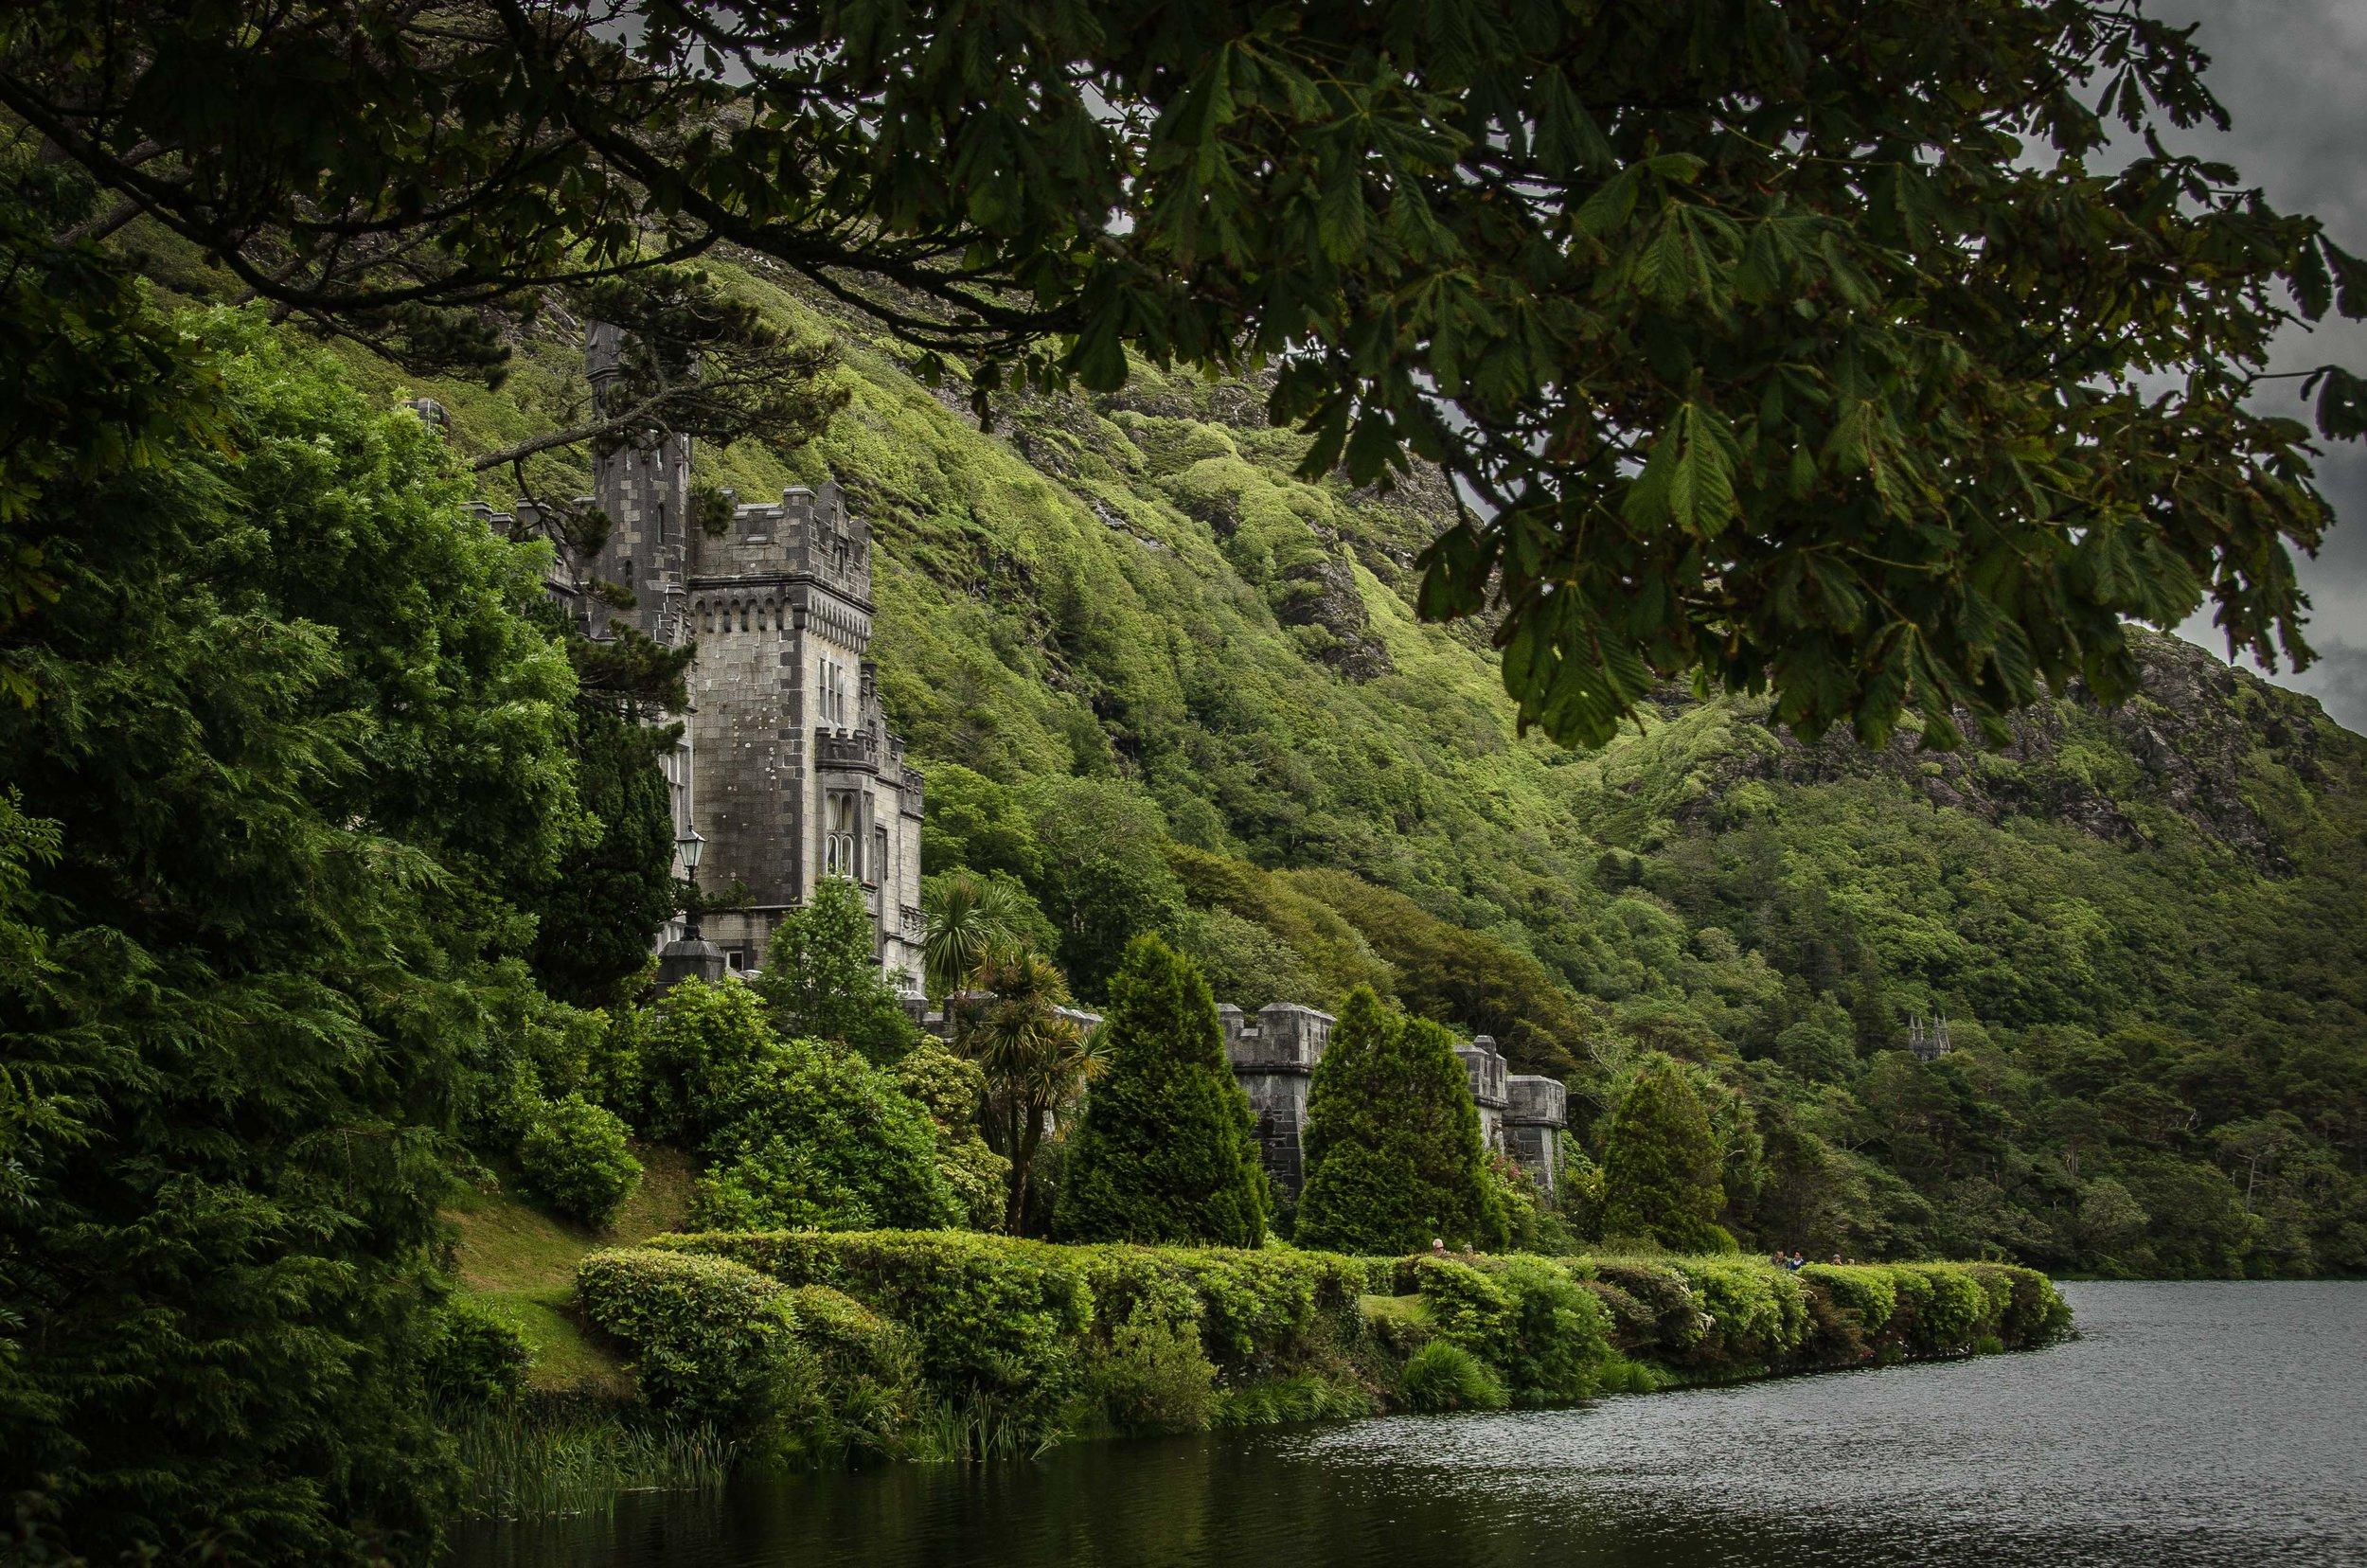 Kylemore Abbey. Connemara, Ireland,  2015